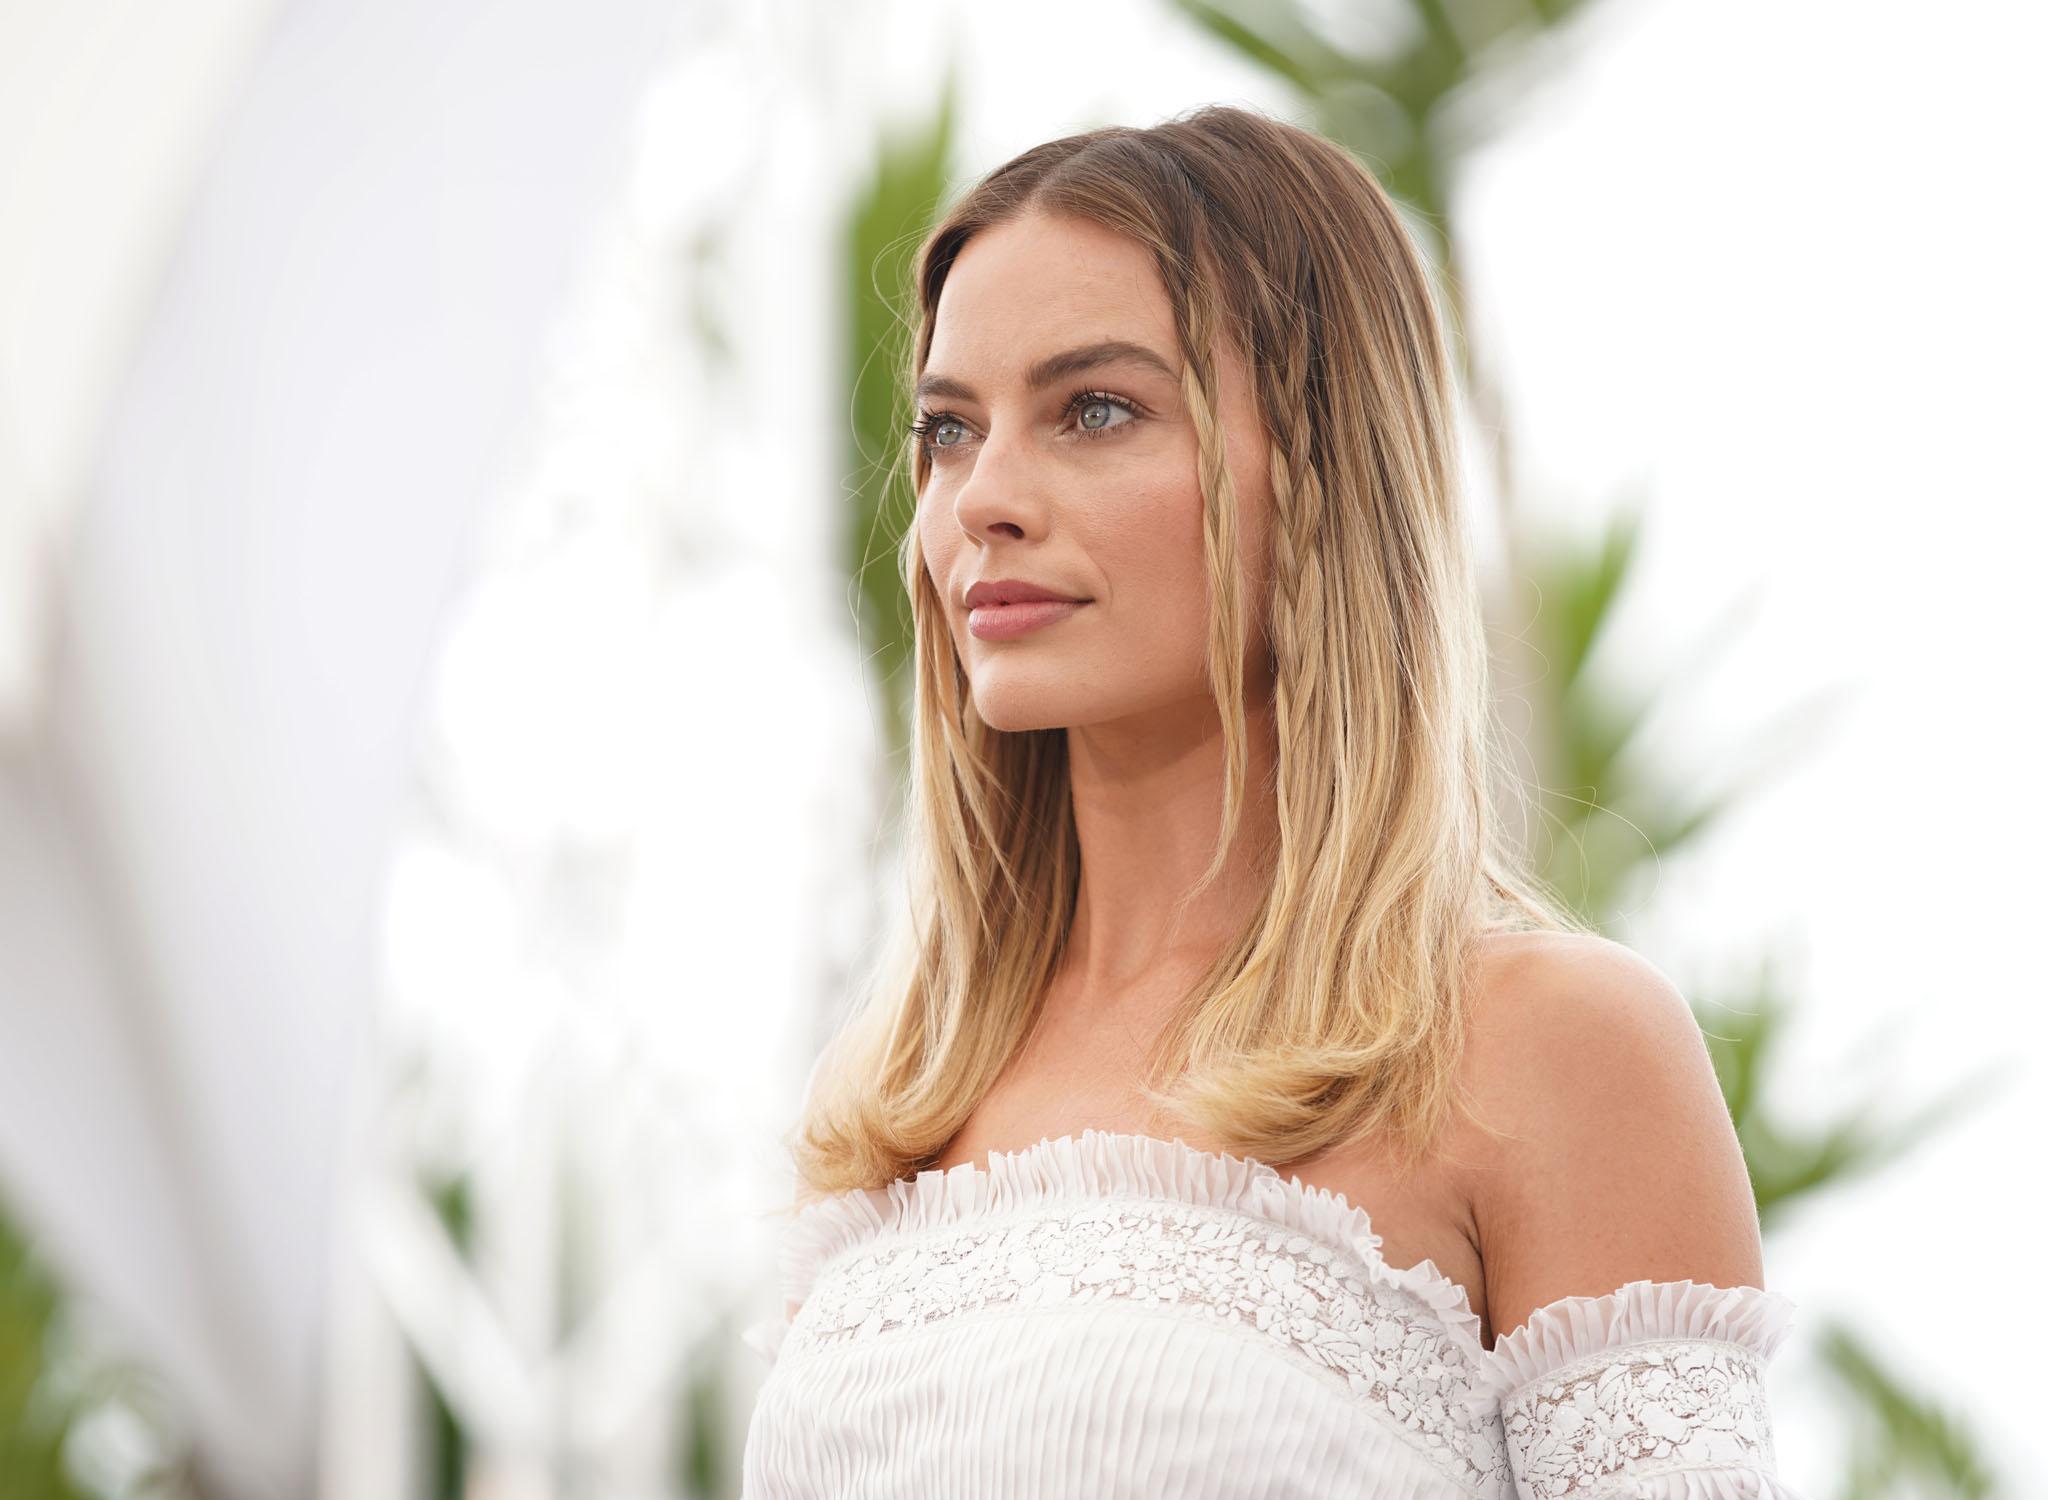 Margot i hvid top